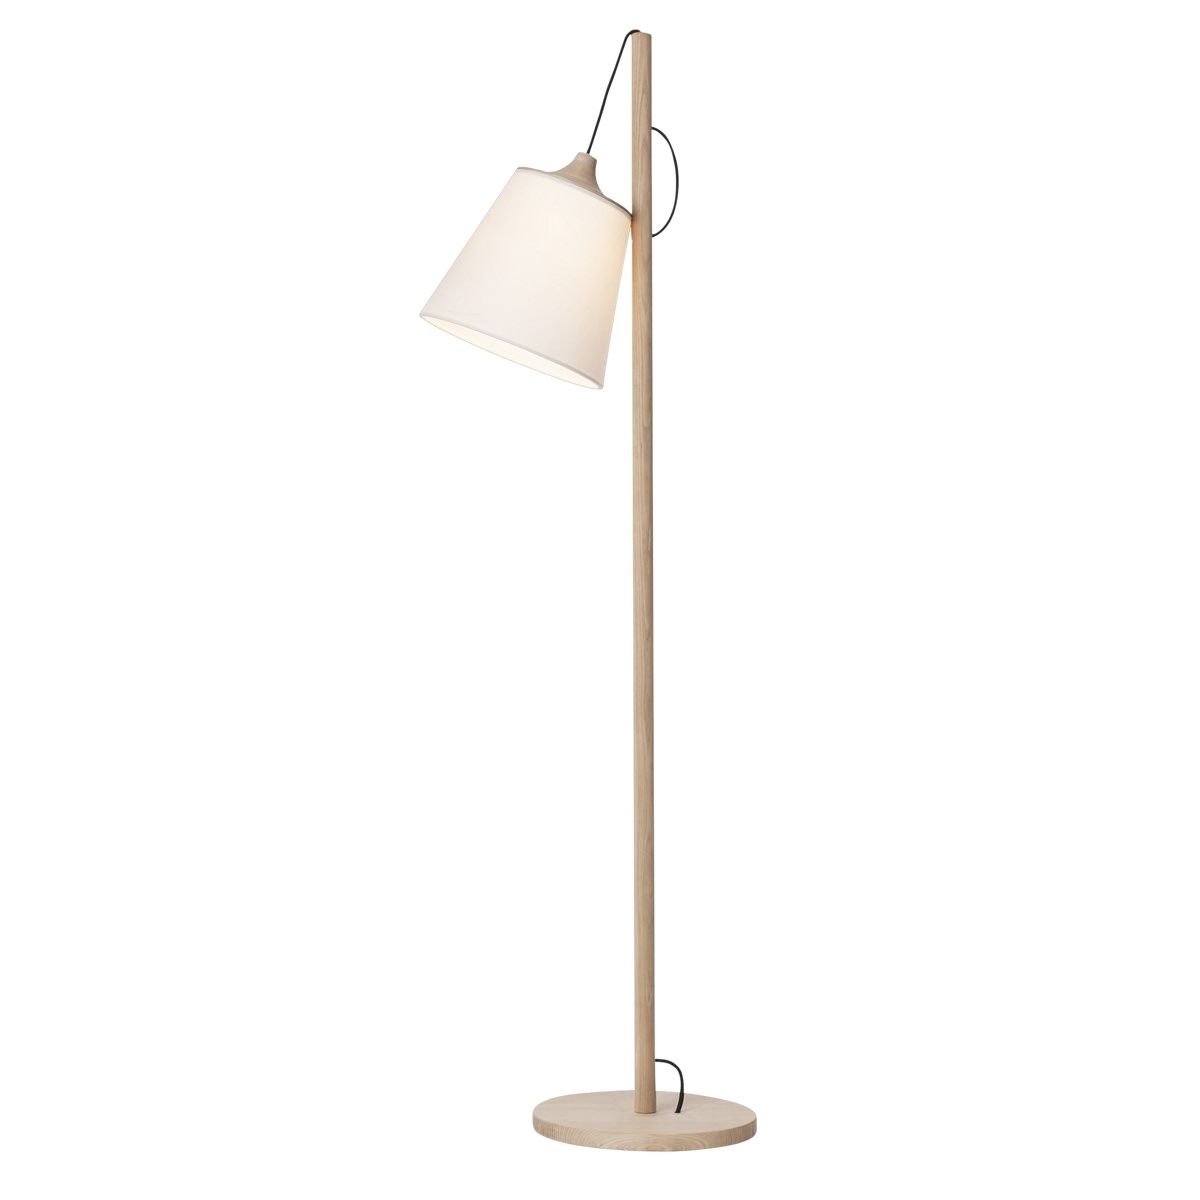 Muuto Pull Floor Lamp in Oak